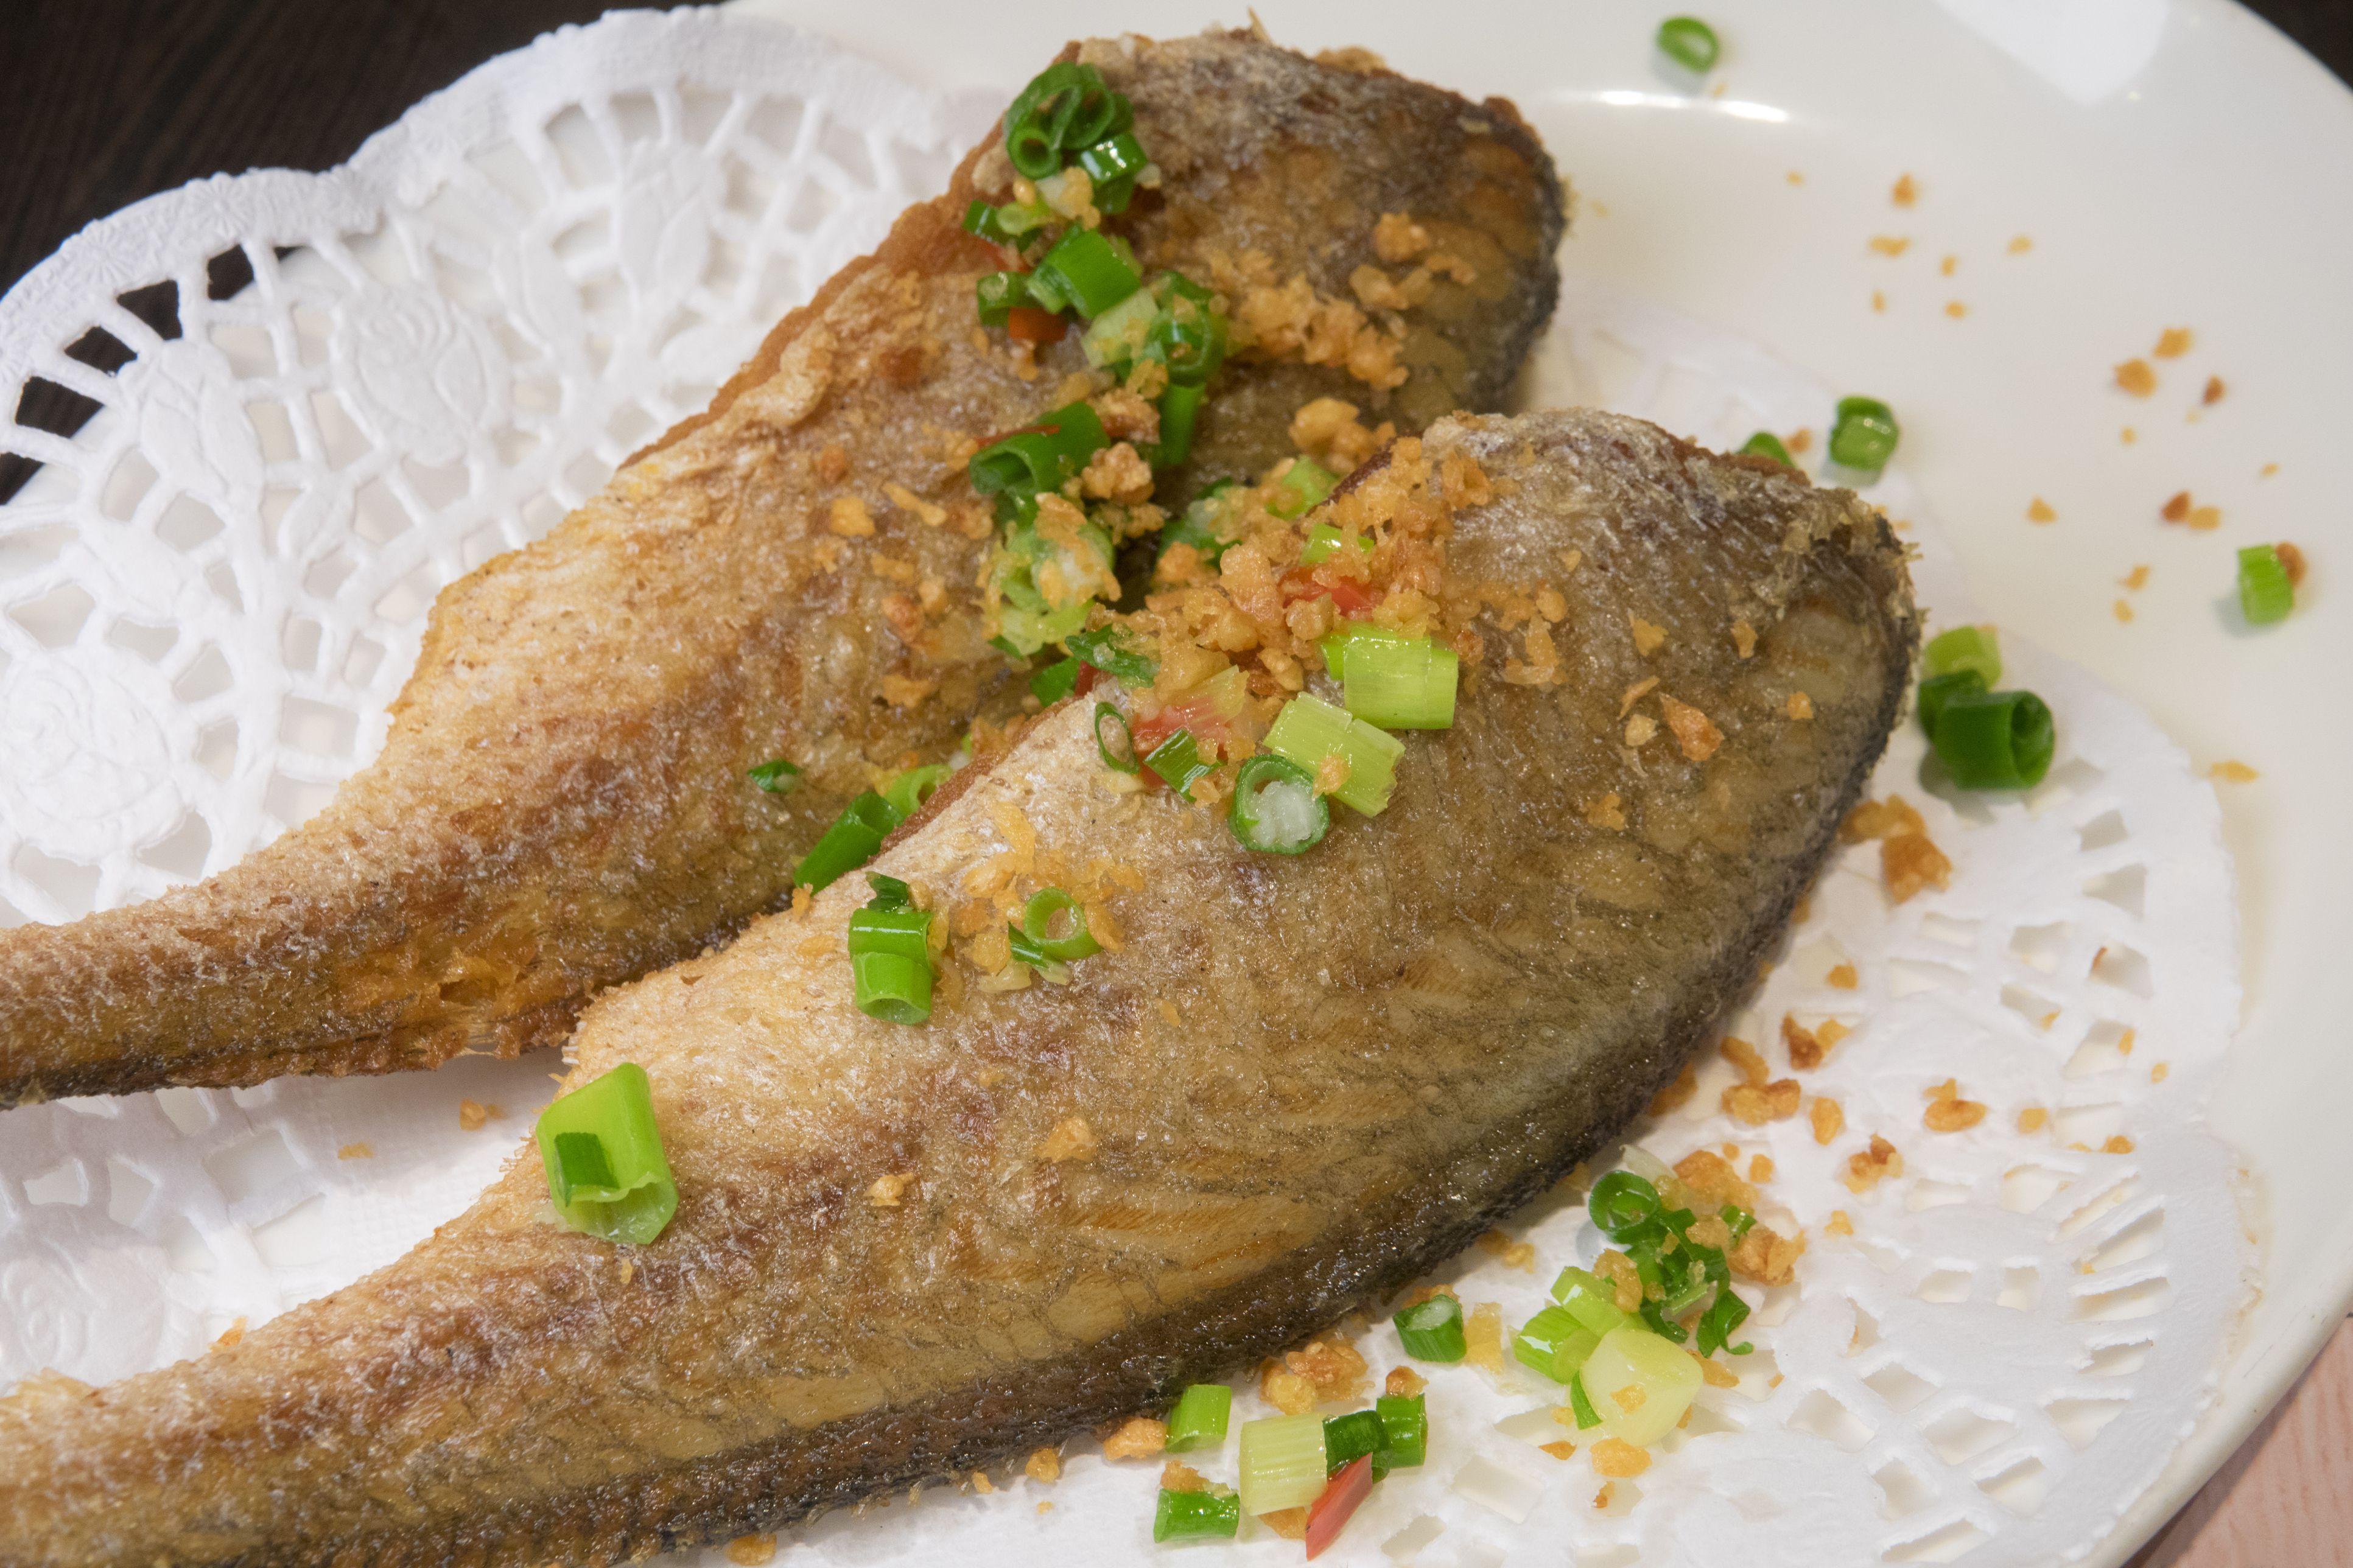 Korean Pan Fried Whole Fish Yellow Croaker Recipe